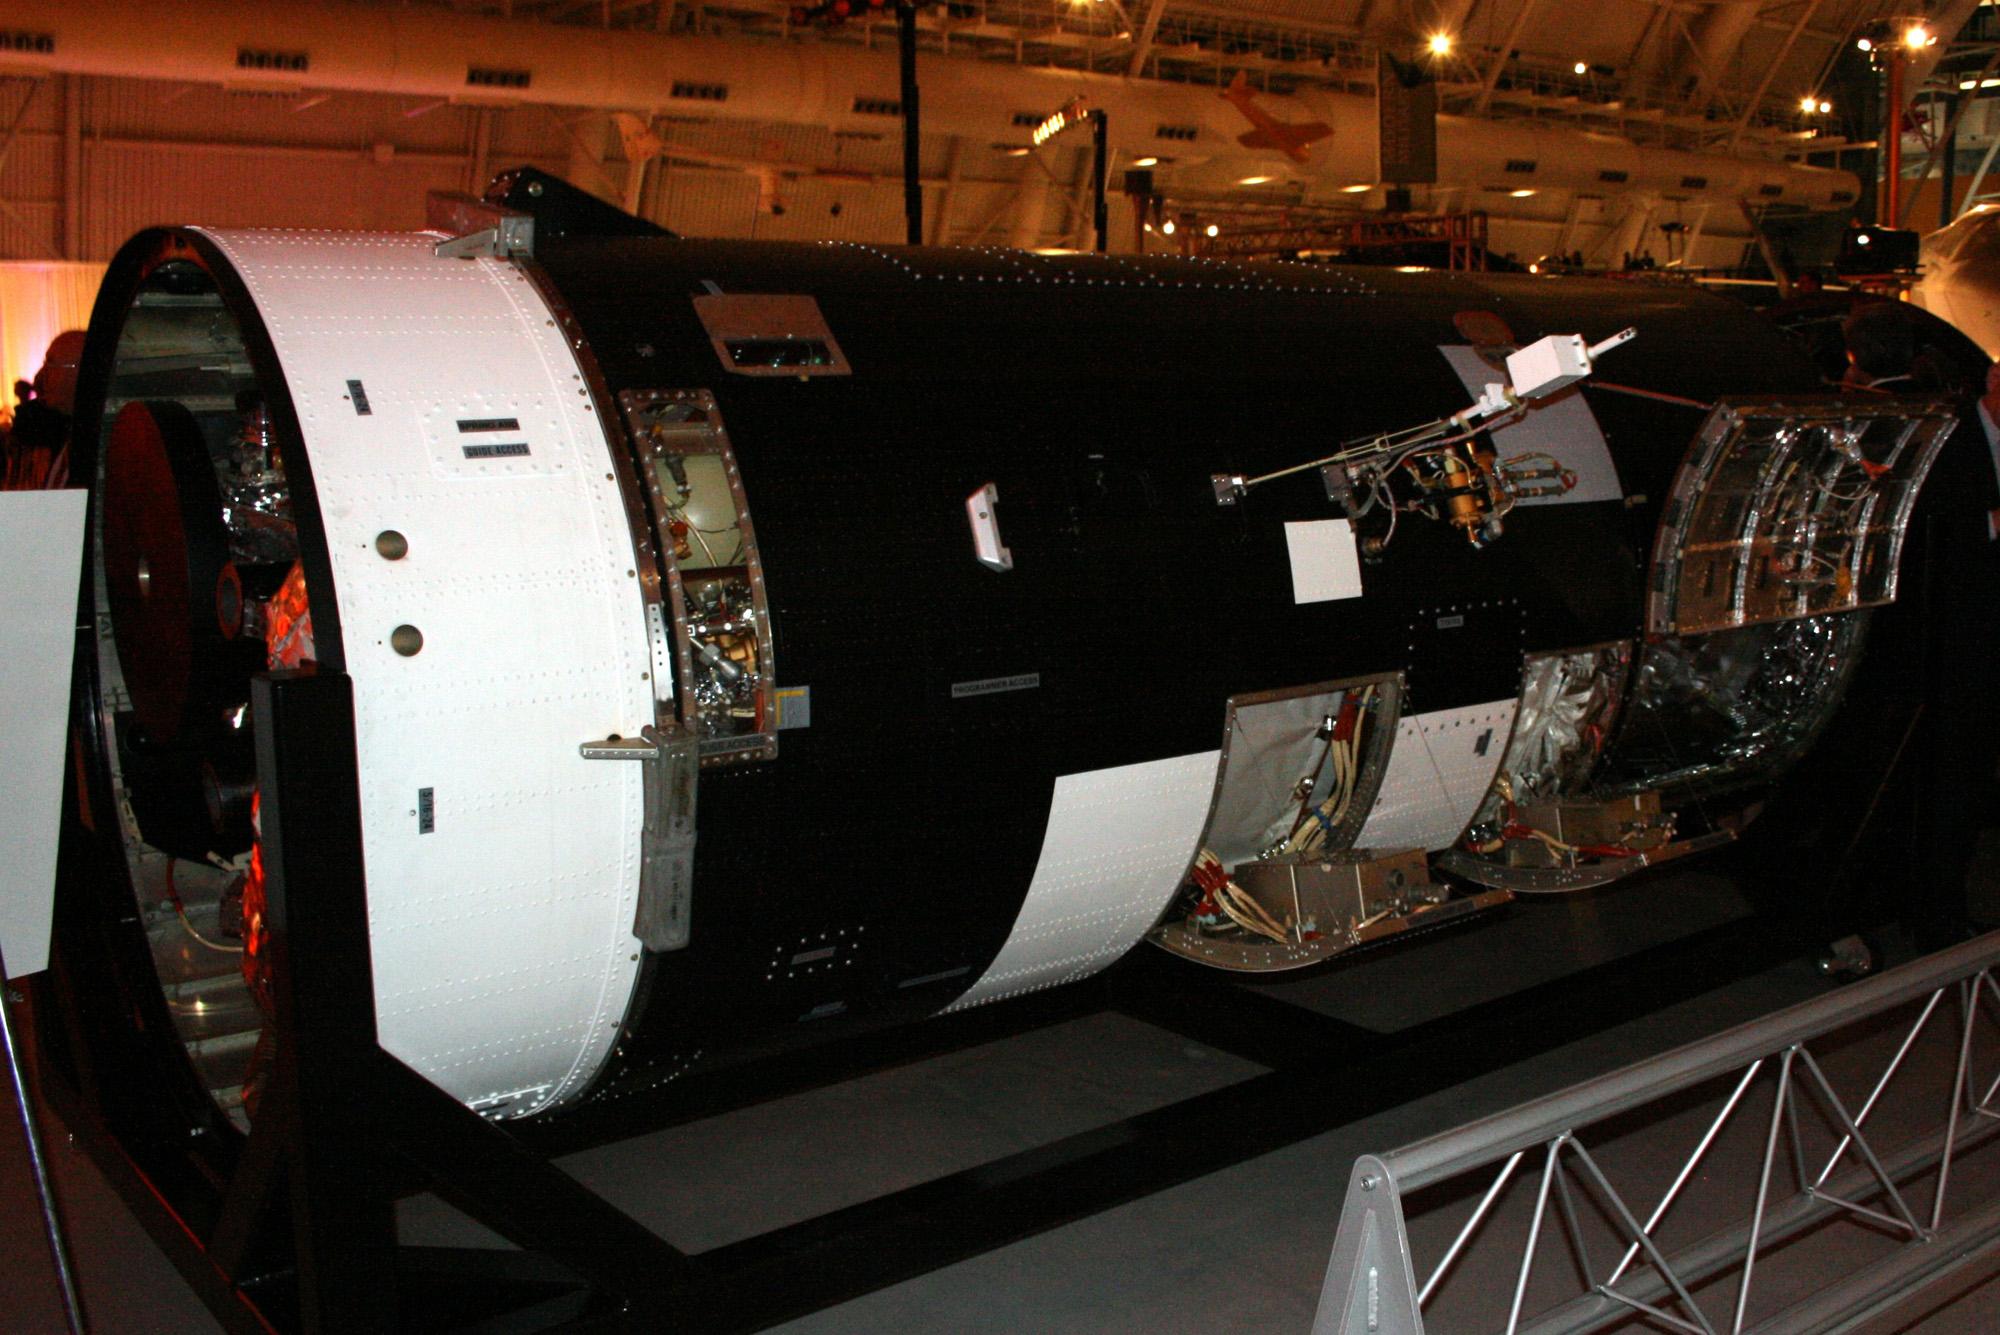 KH-7 GAMBIT Spy Satellite: Side View